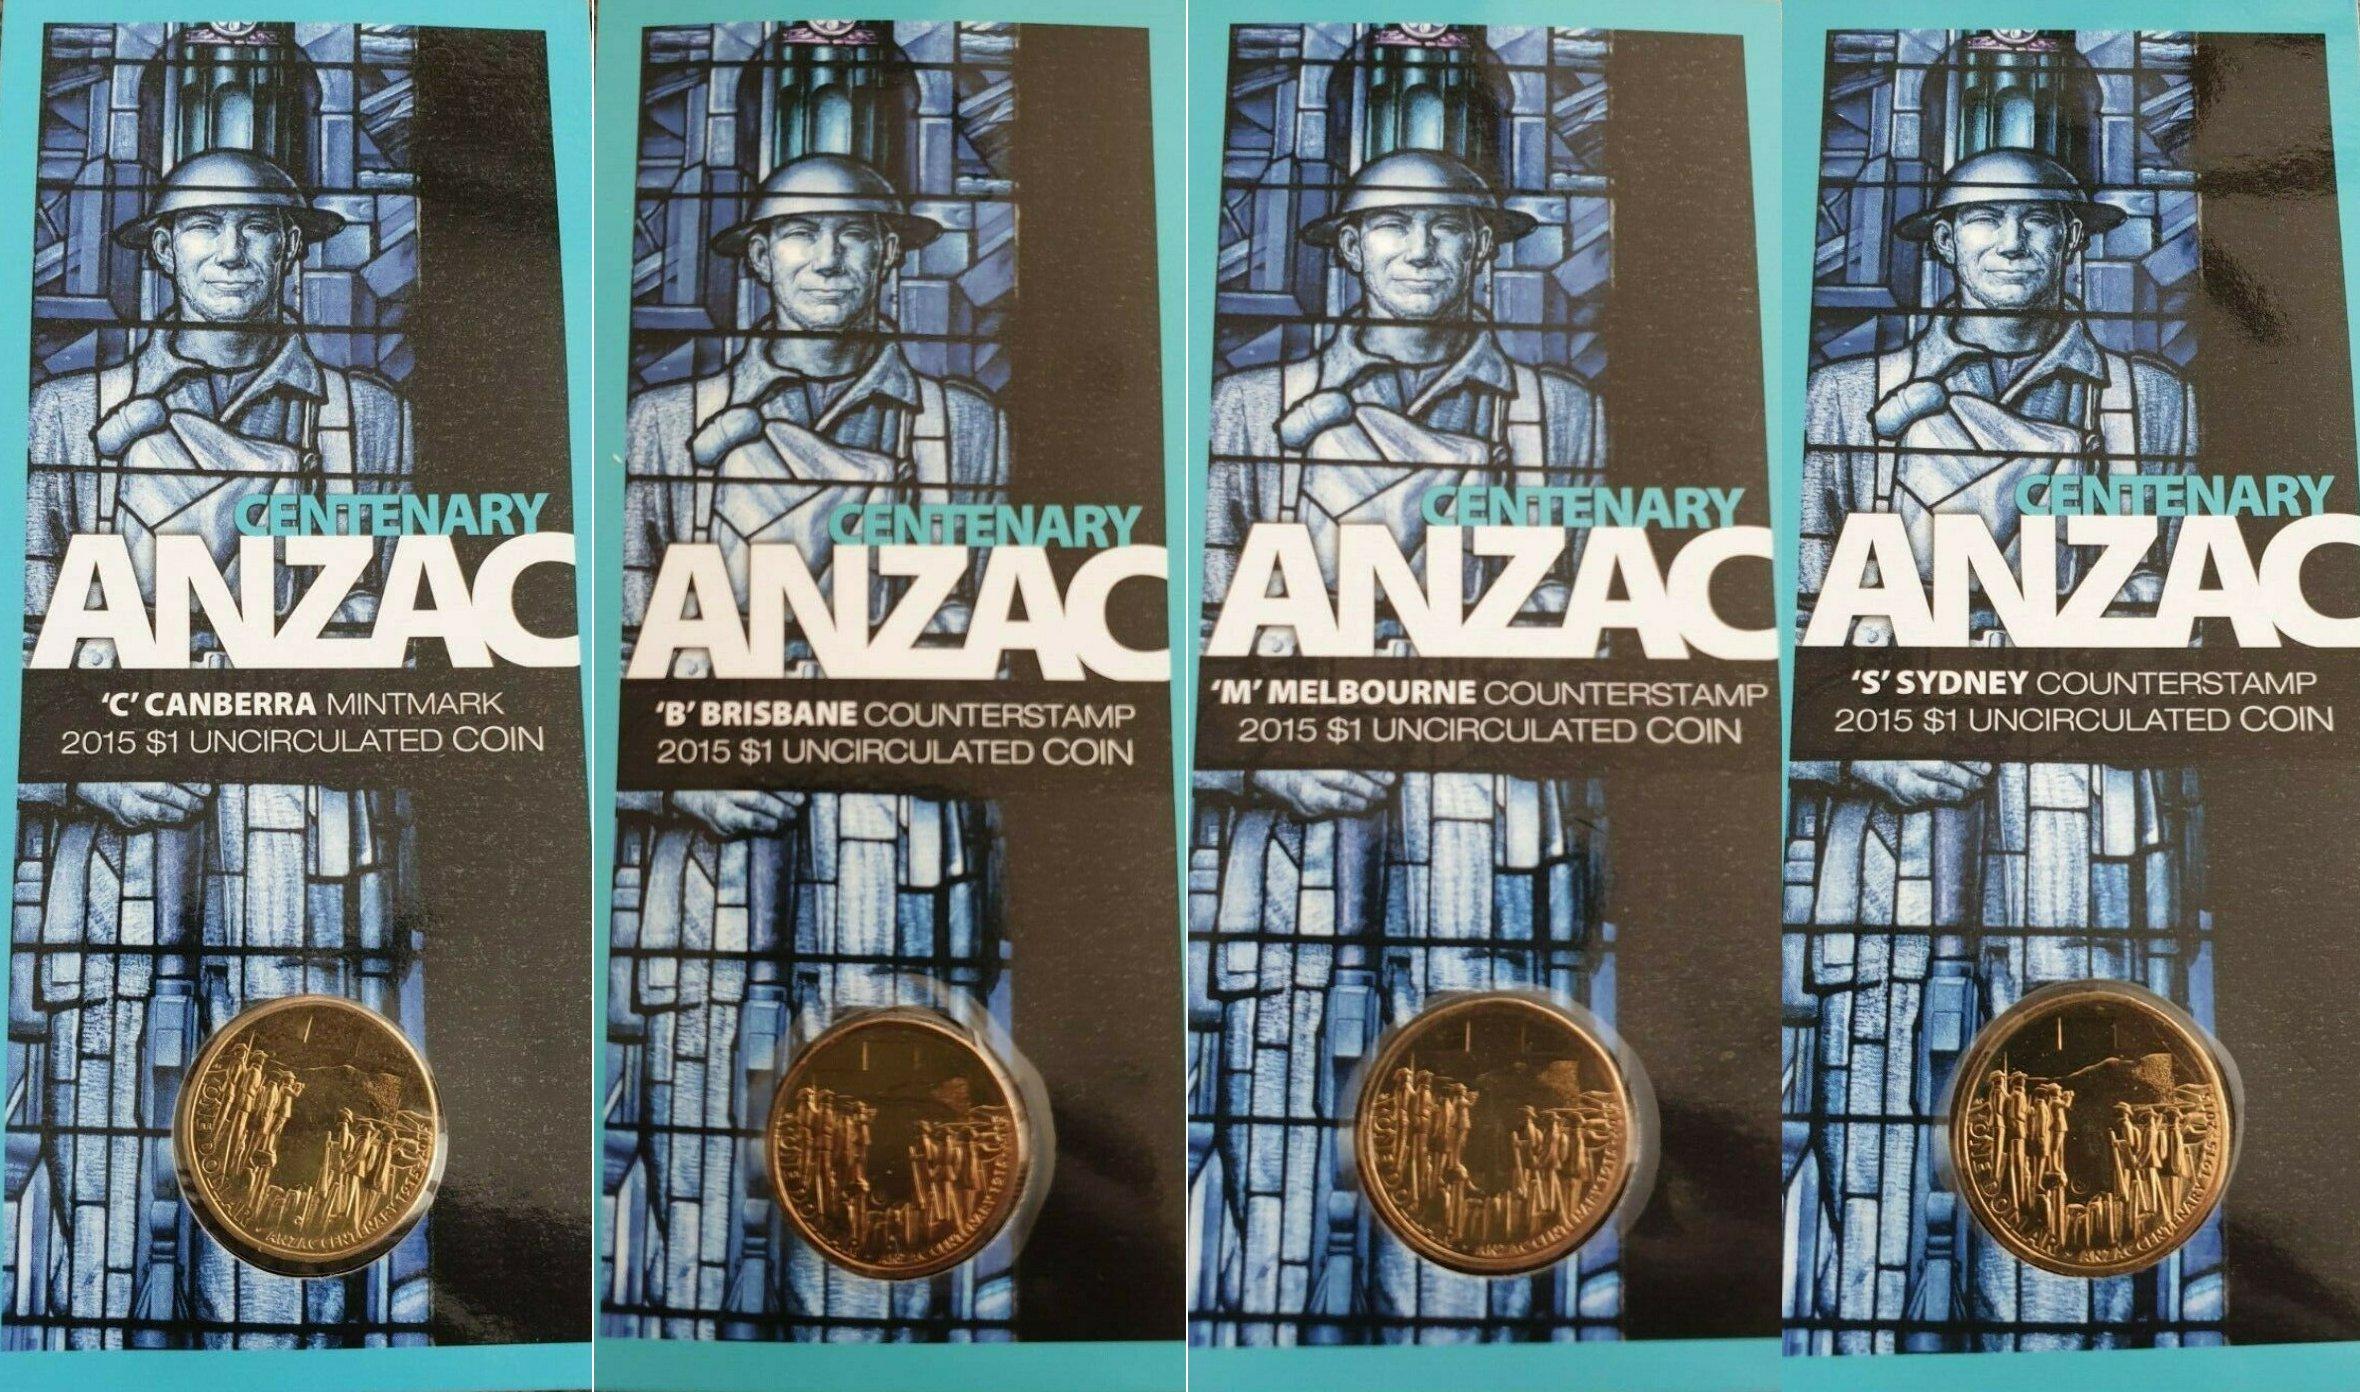 /'C/' Mintmark UNC rare Australia $1 One dollar coin 2015 CENTENARY ANZAC